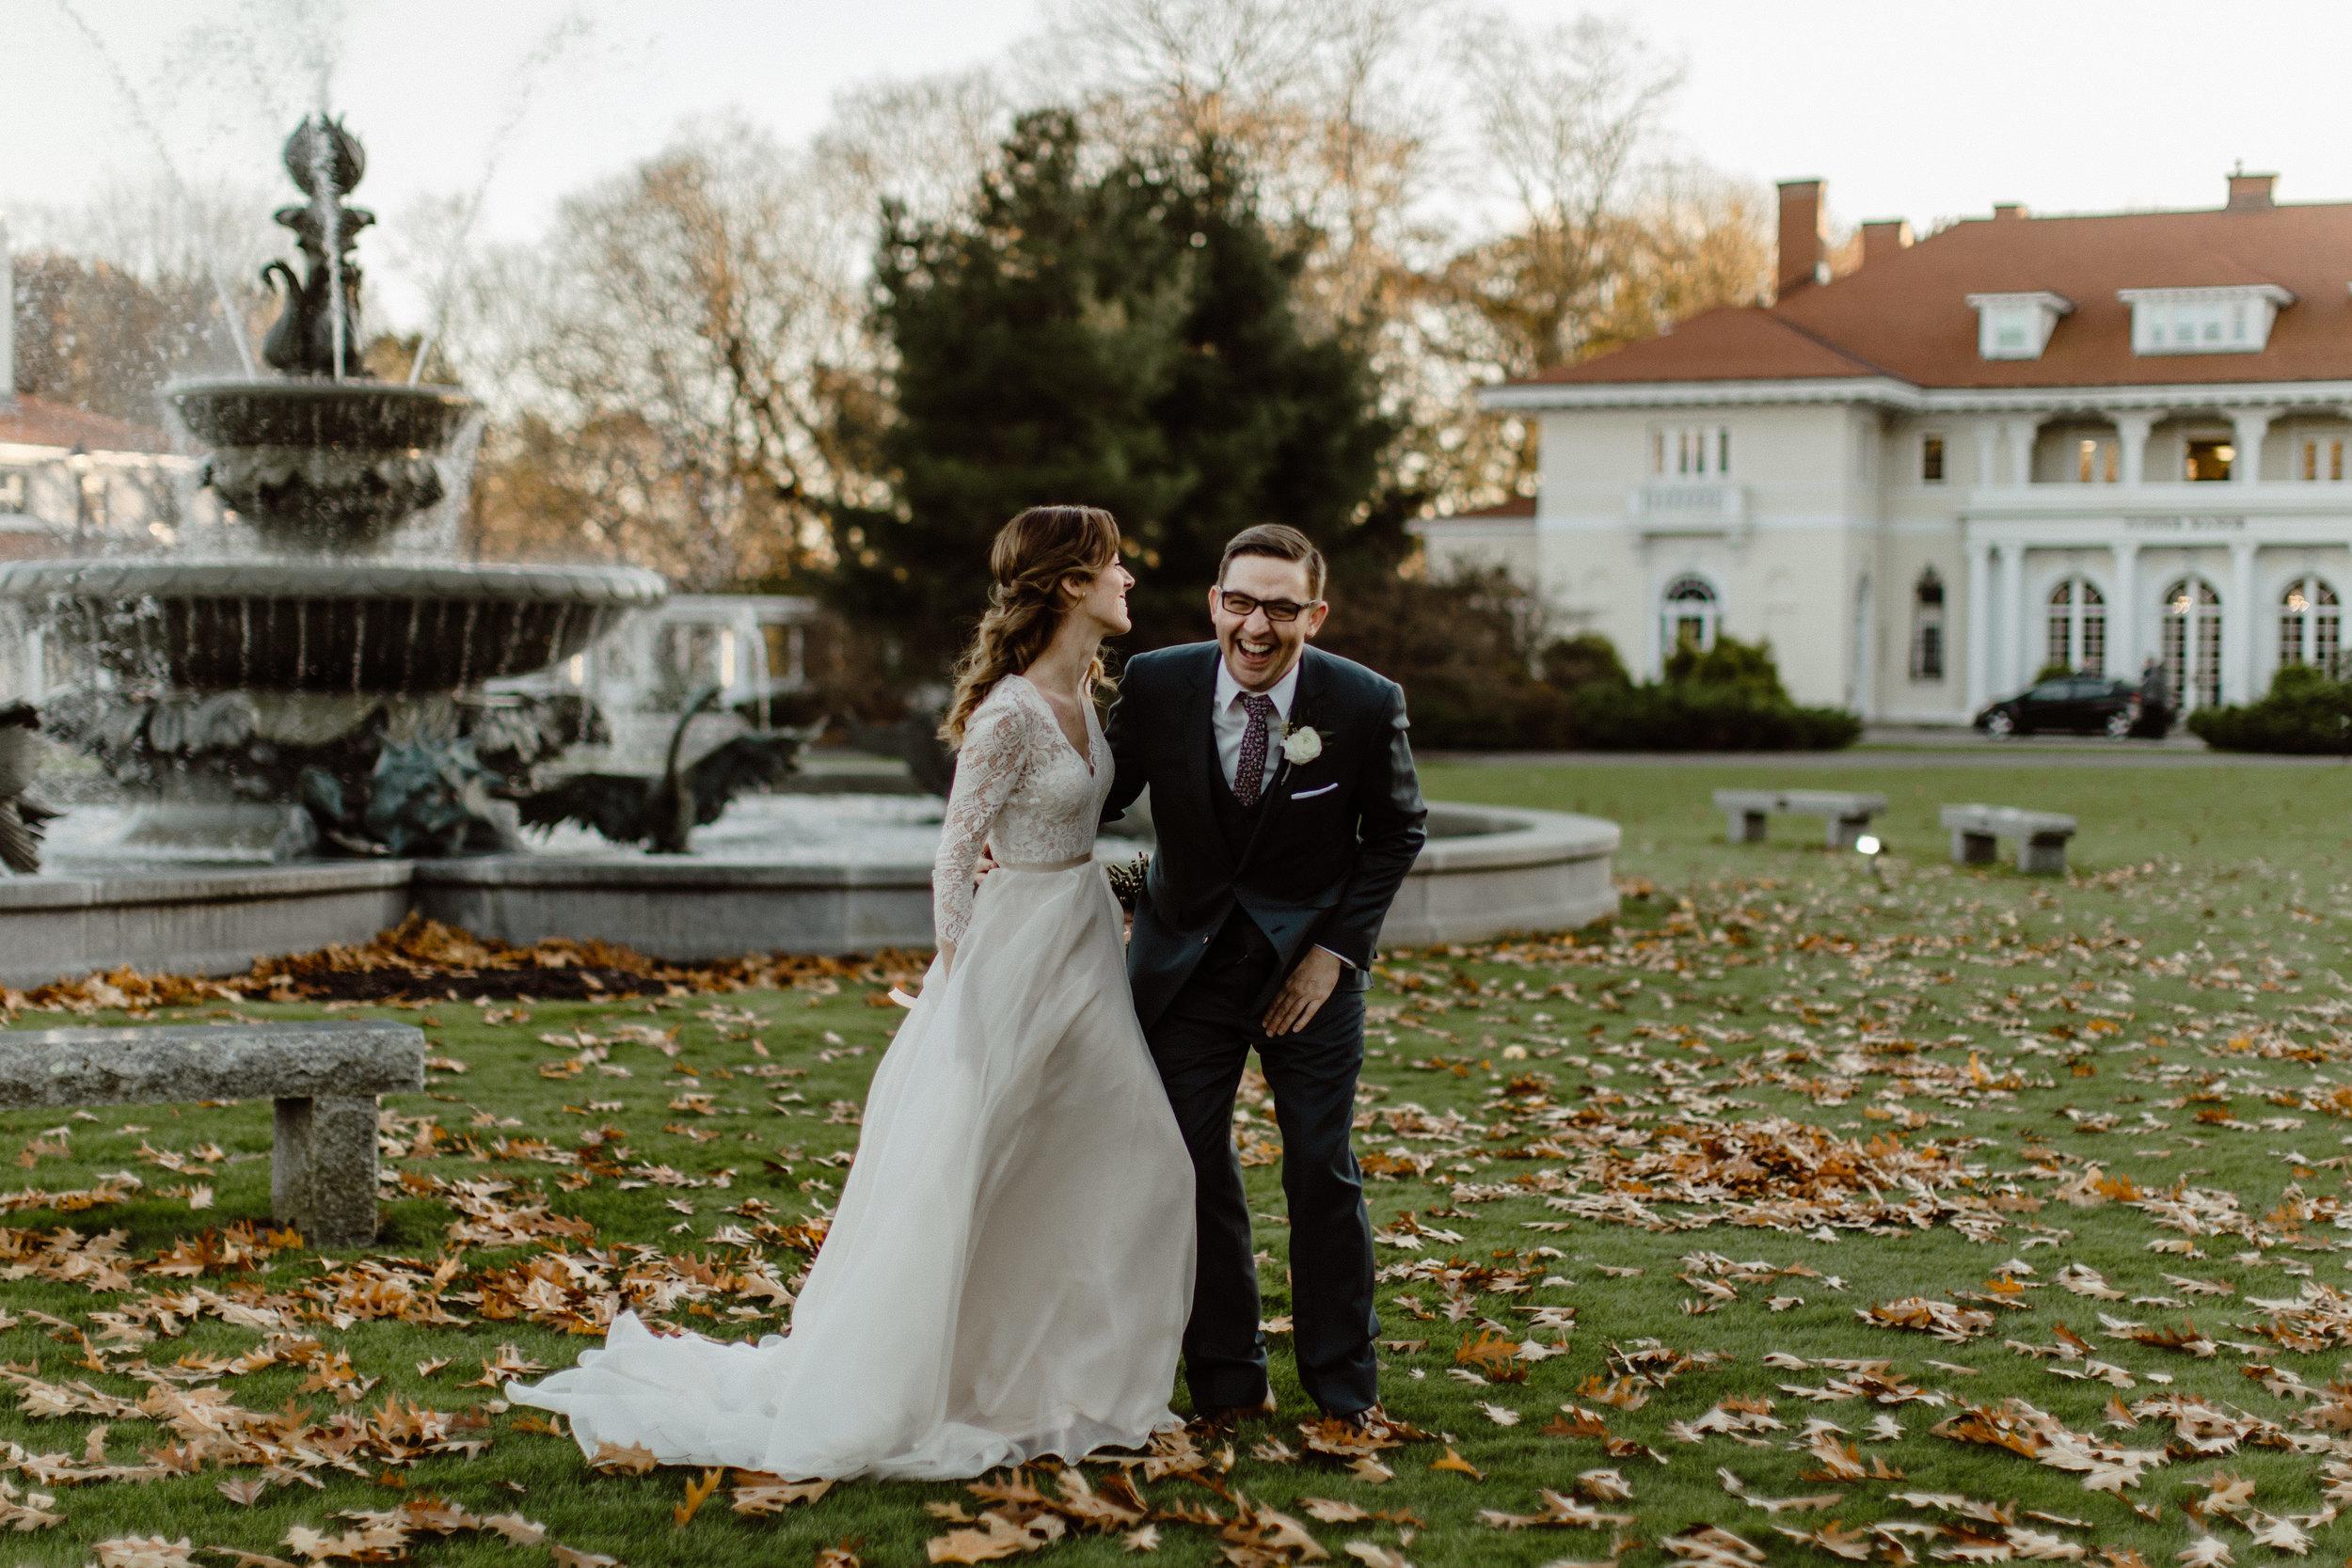 beverly_ma_wedding-29.jpg